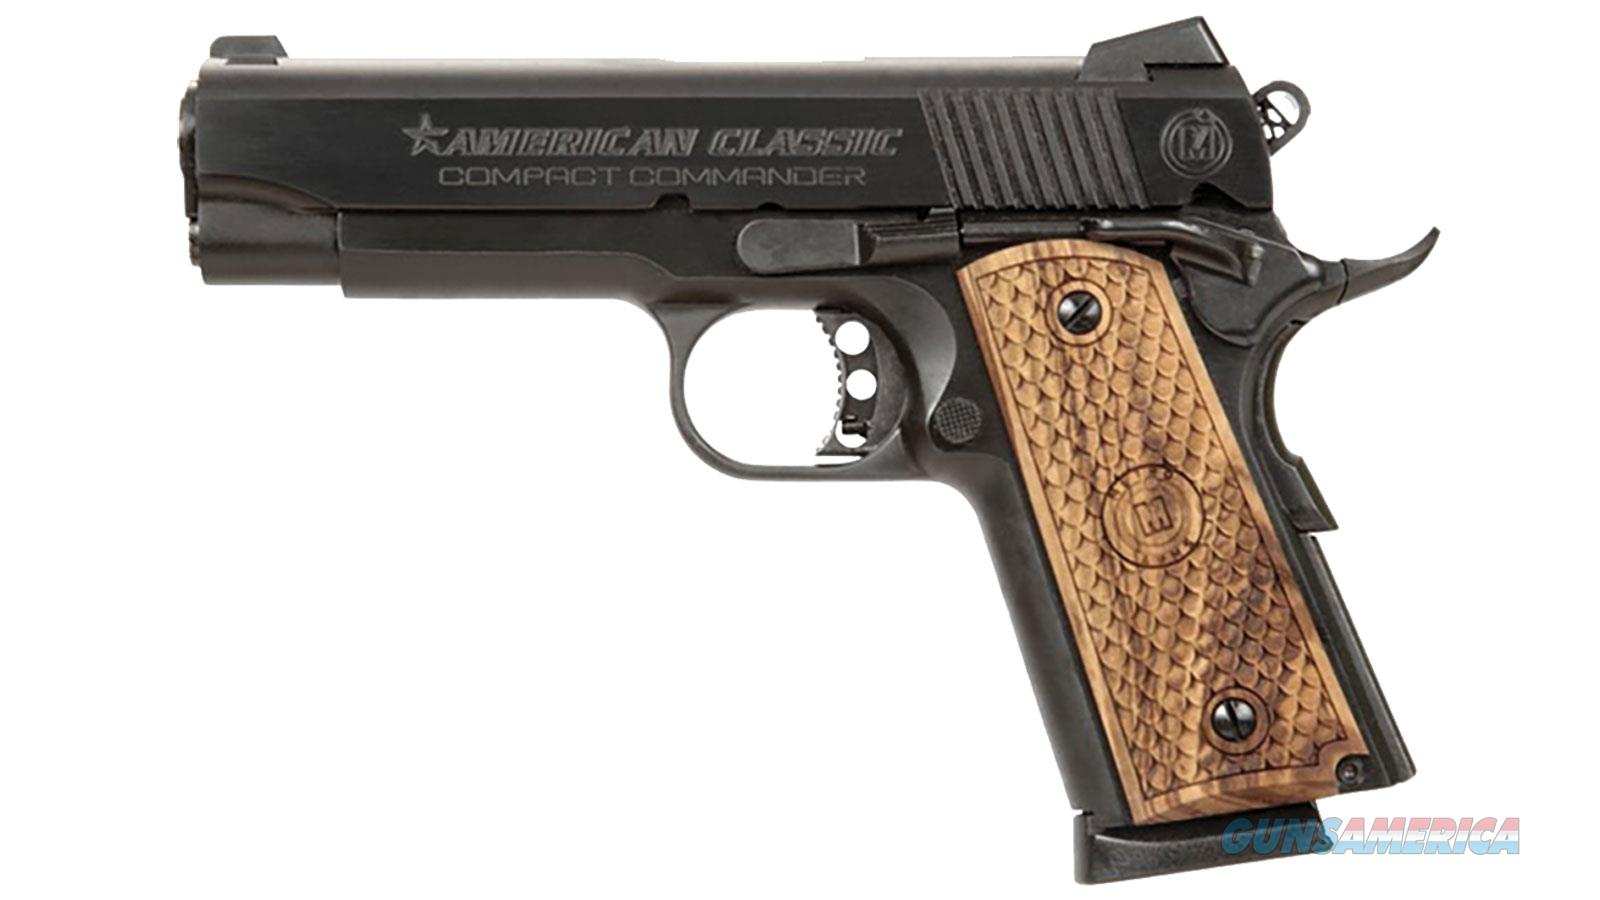 Import Sports Cmpt Cmdr 45Acp 4.25 ACCC45B  Guns > Pistols > IJ Misc Pistols